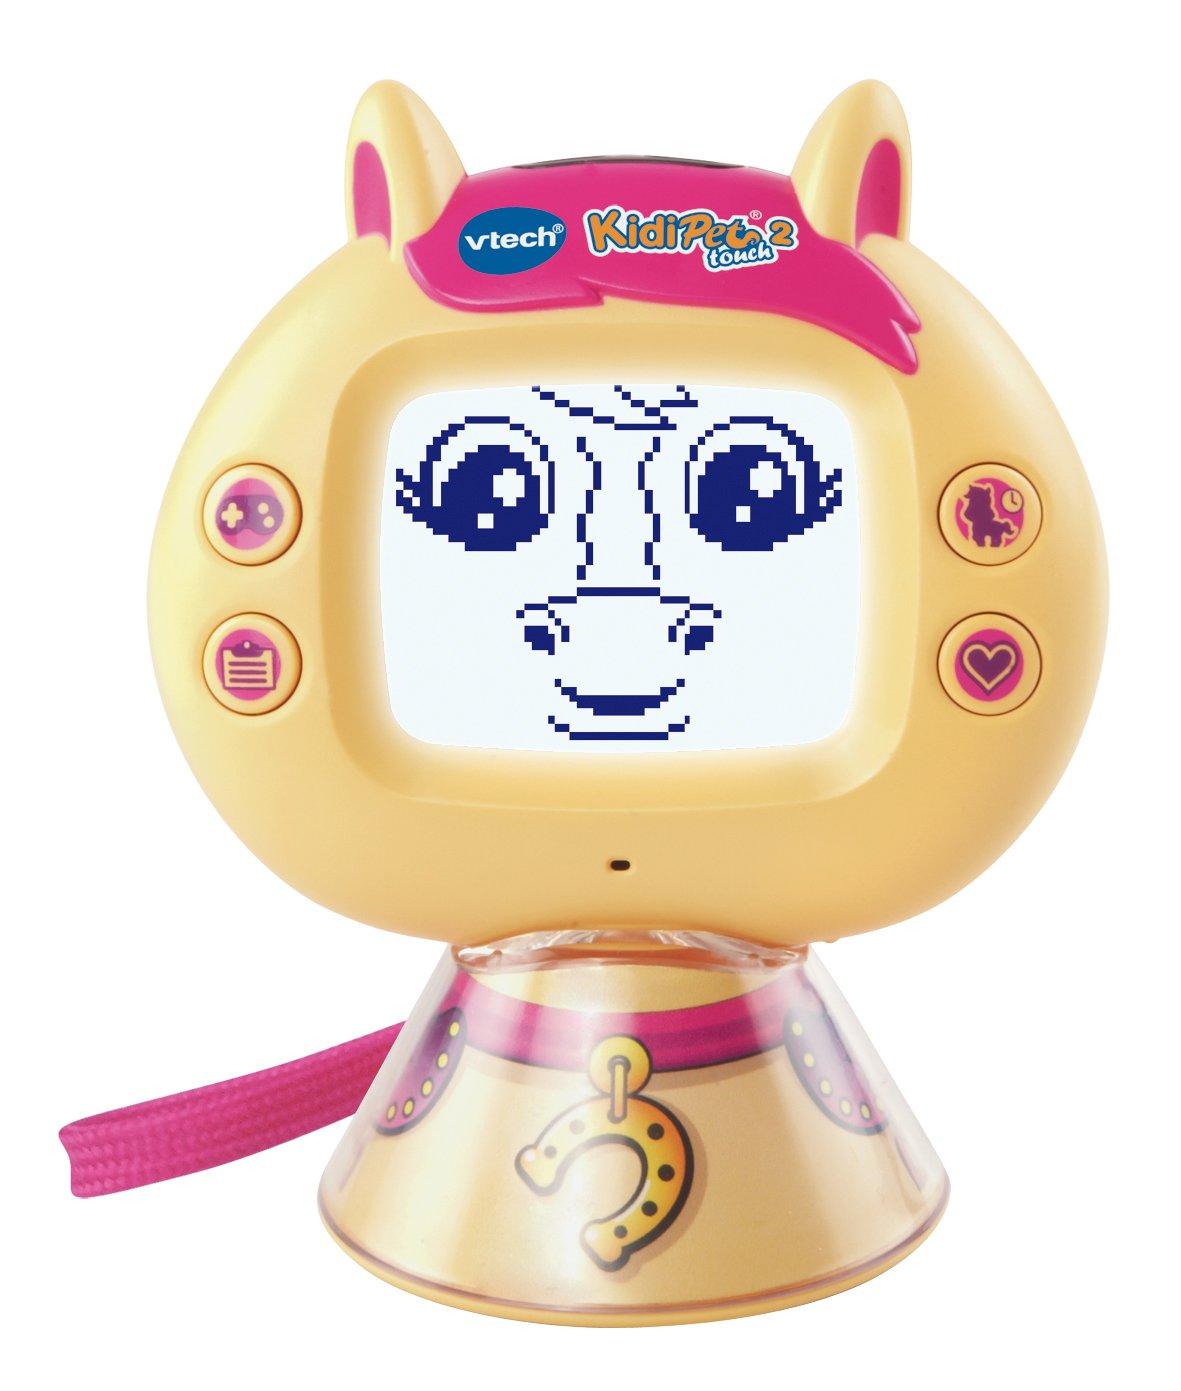 VTech 80-156204 – Kidi Pet Touch 2, Pony online bestellen